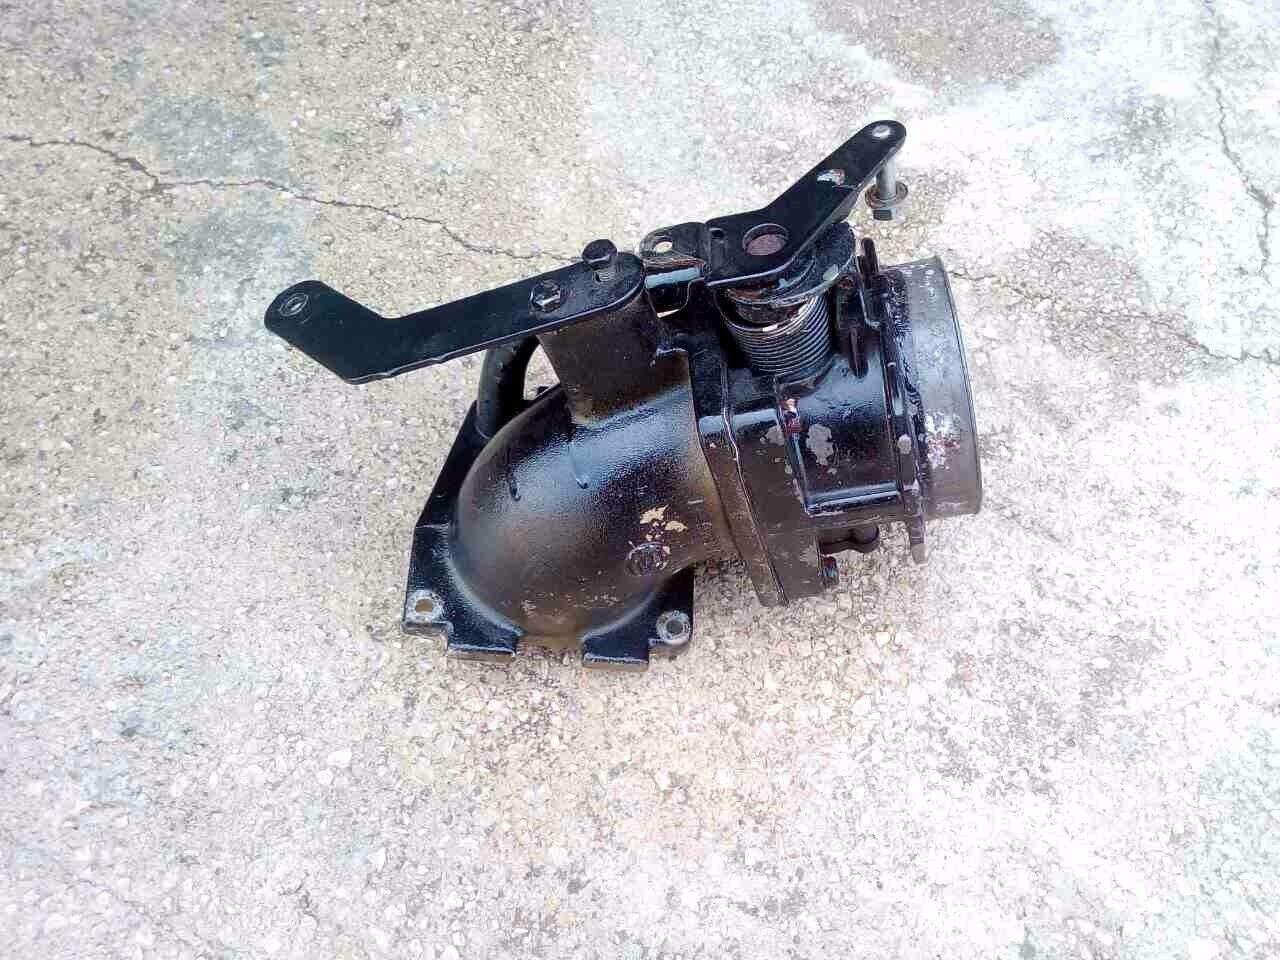 MERCRUISER 7.4L BRAVO (MPI)(GEN. VI) Trottle GM 454 V-8 2000 Trottle VI) Body a0bd5e